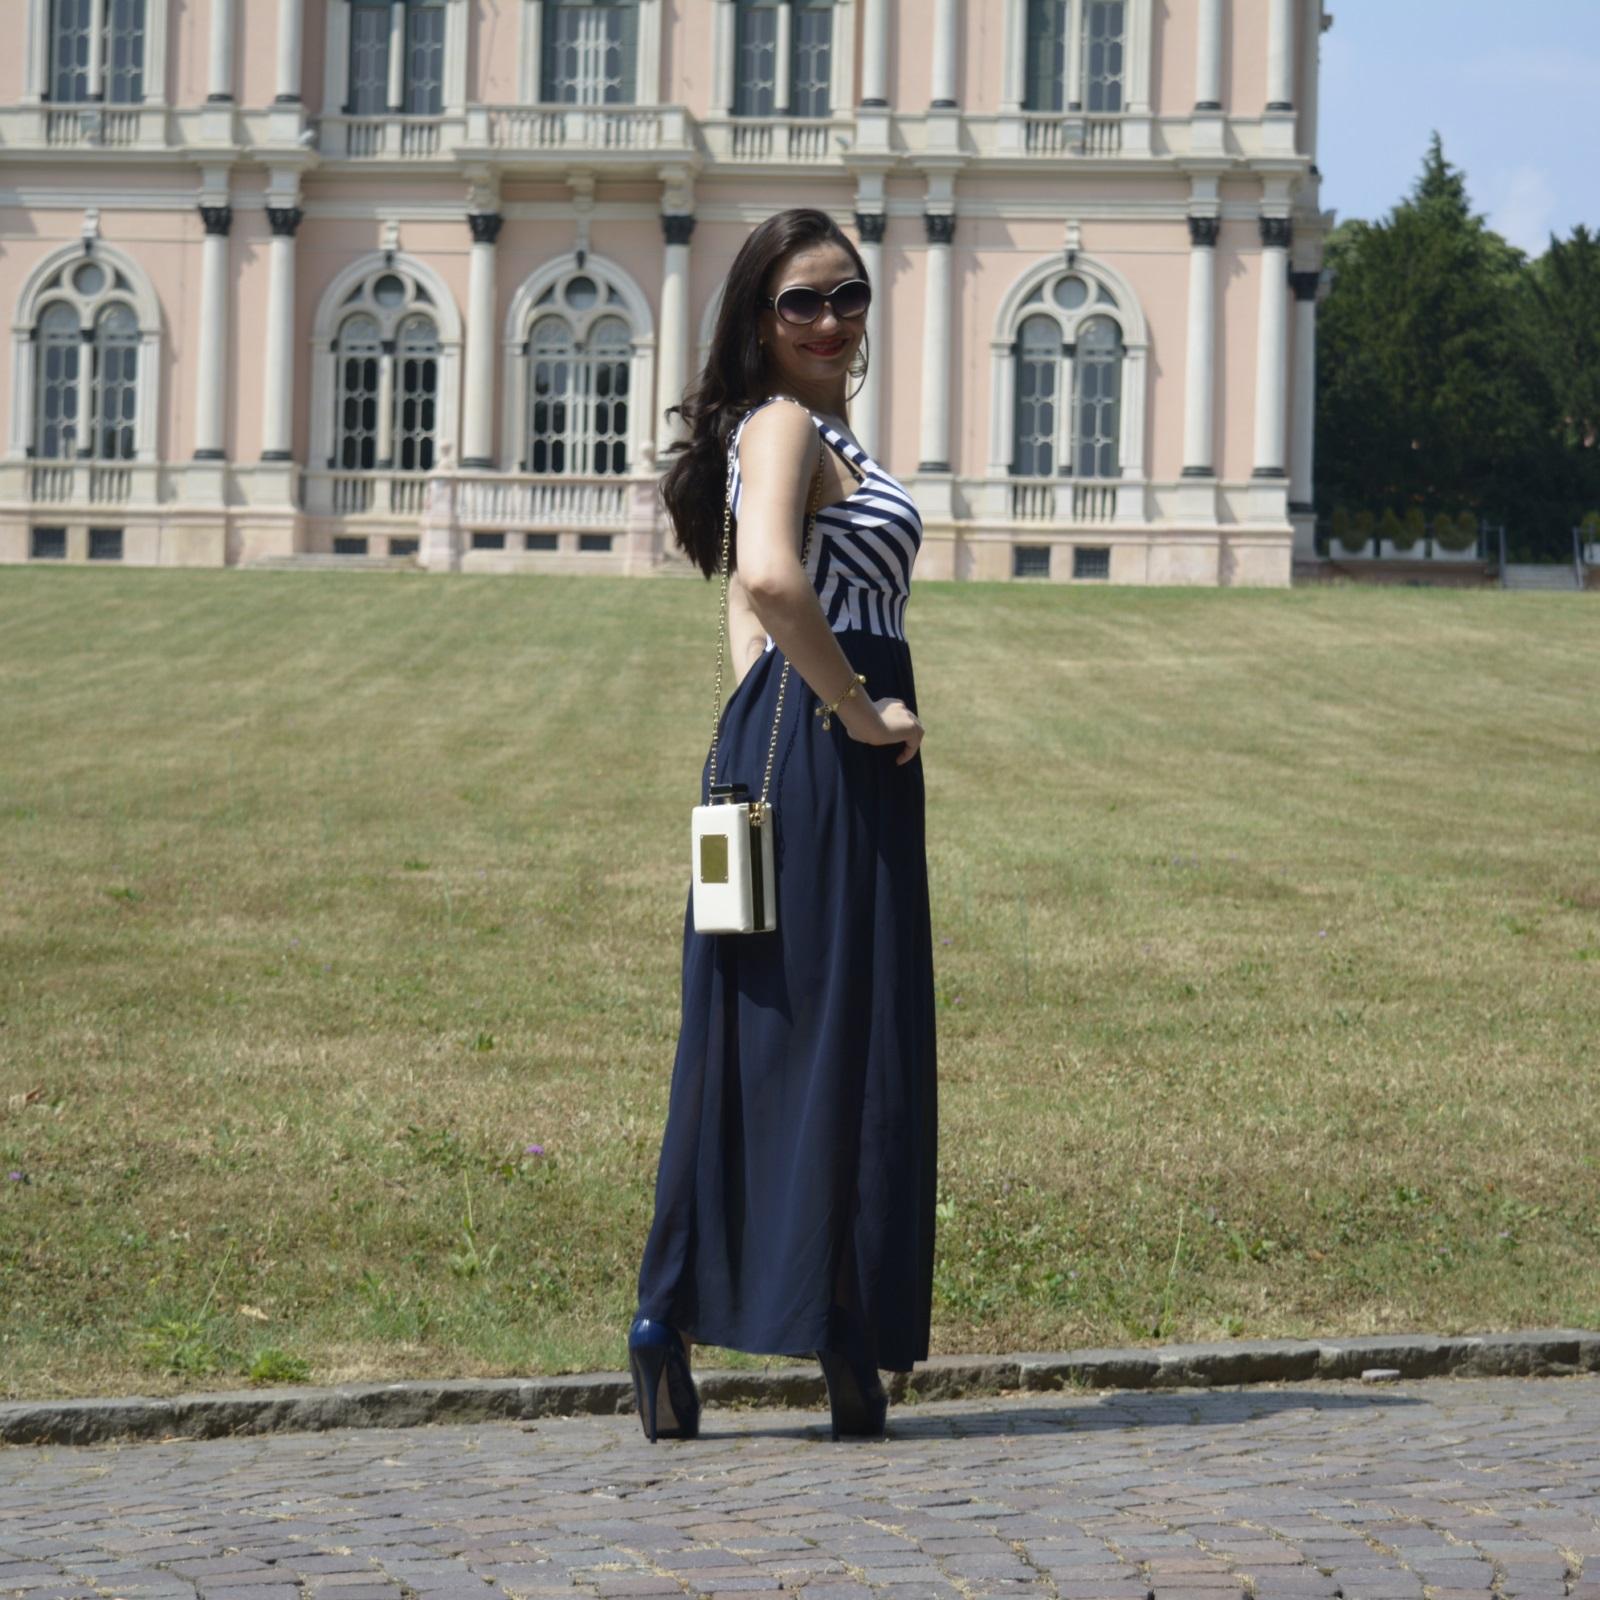 vestido-estilo-navy-longo-nathália-ferrara-10